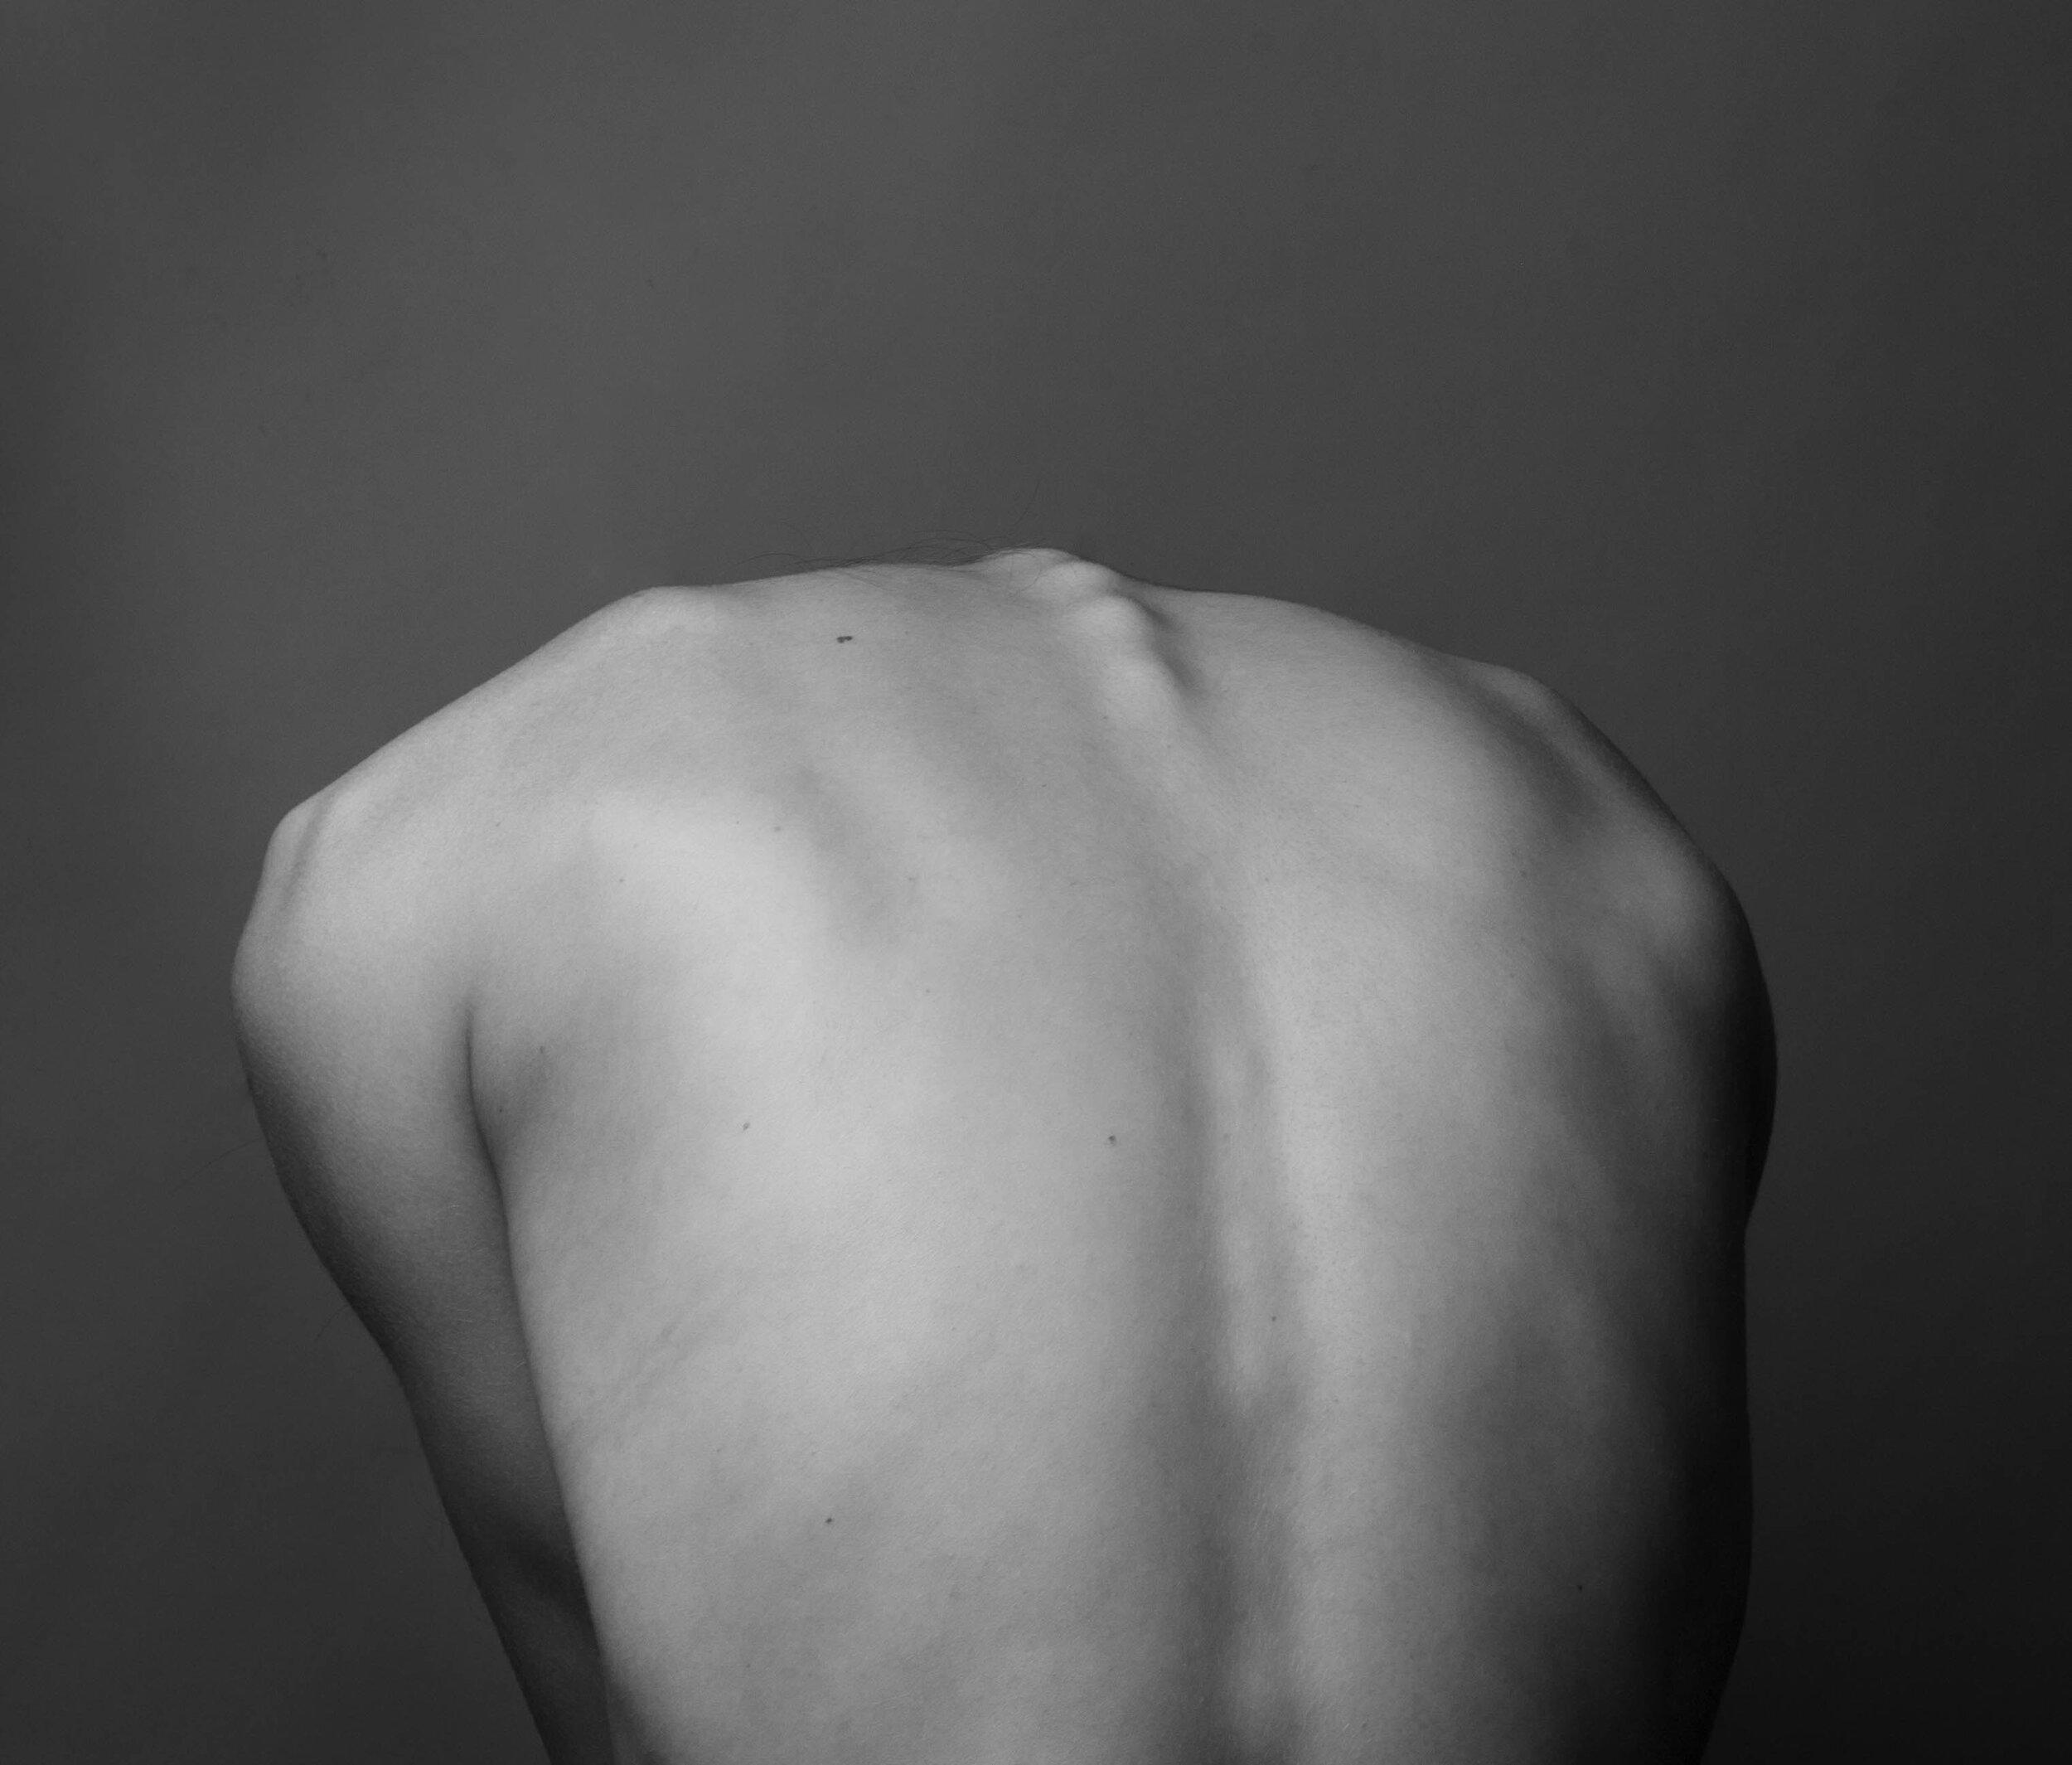 Photo by Inge Poelman, Unsplash